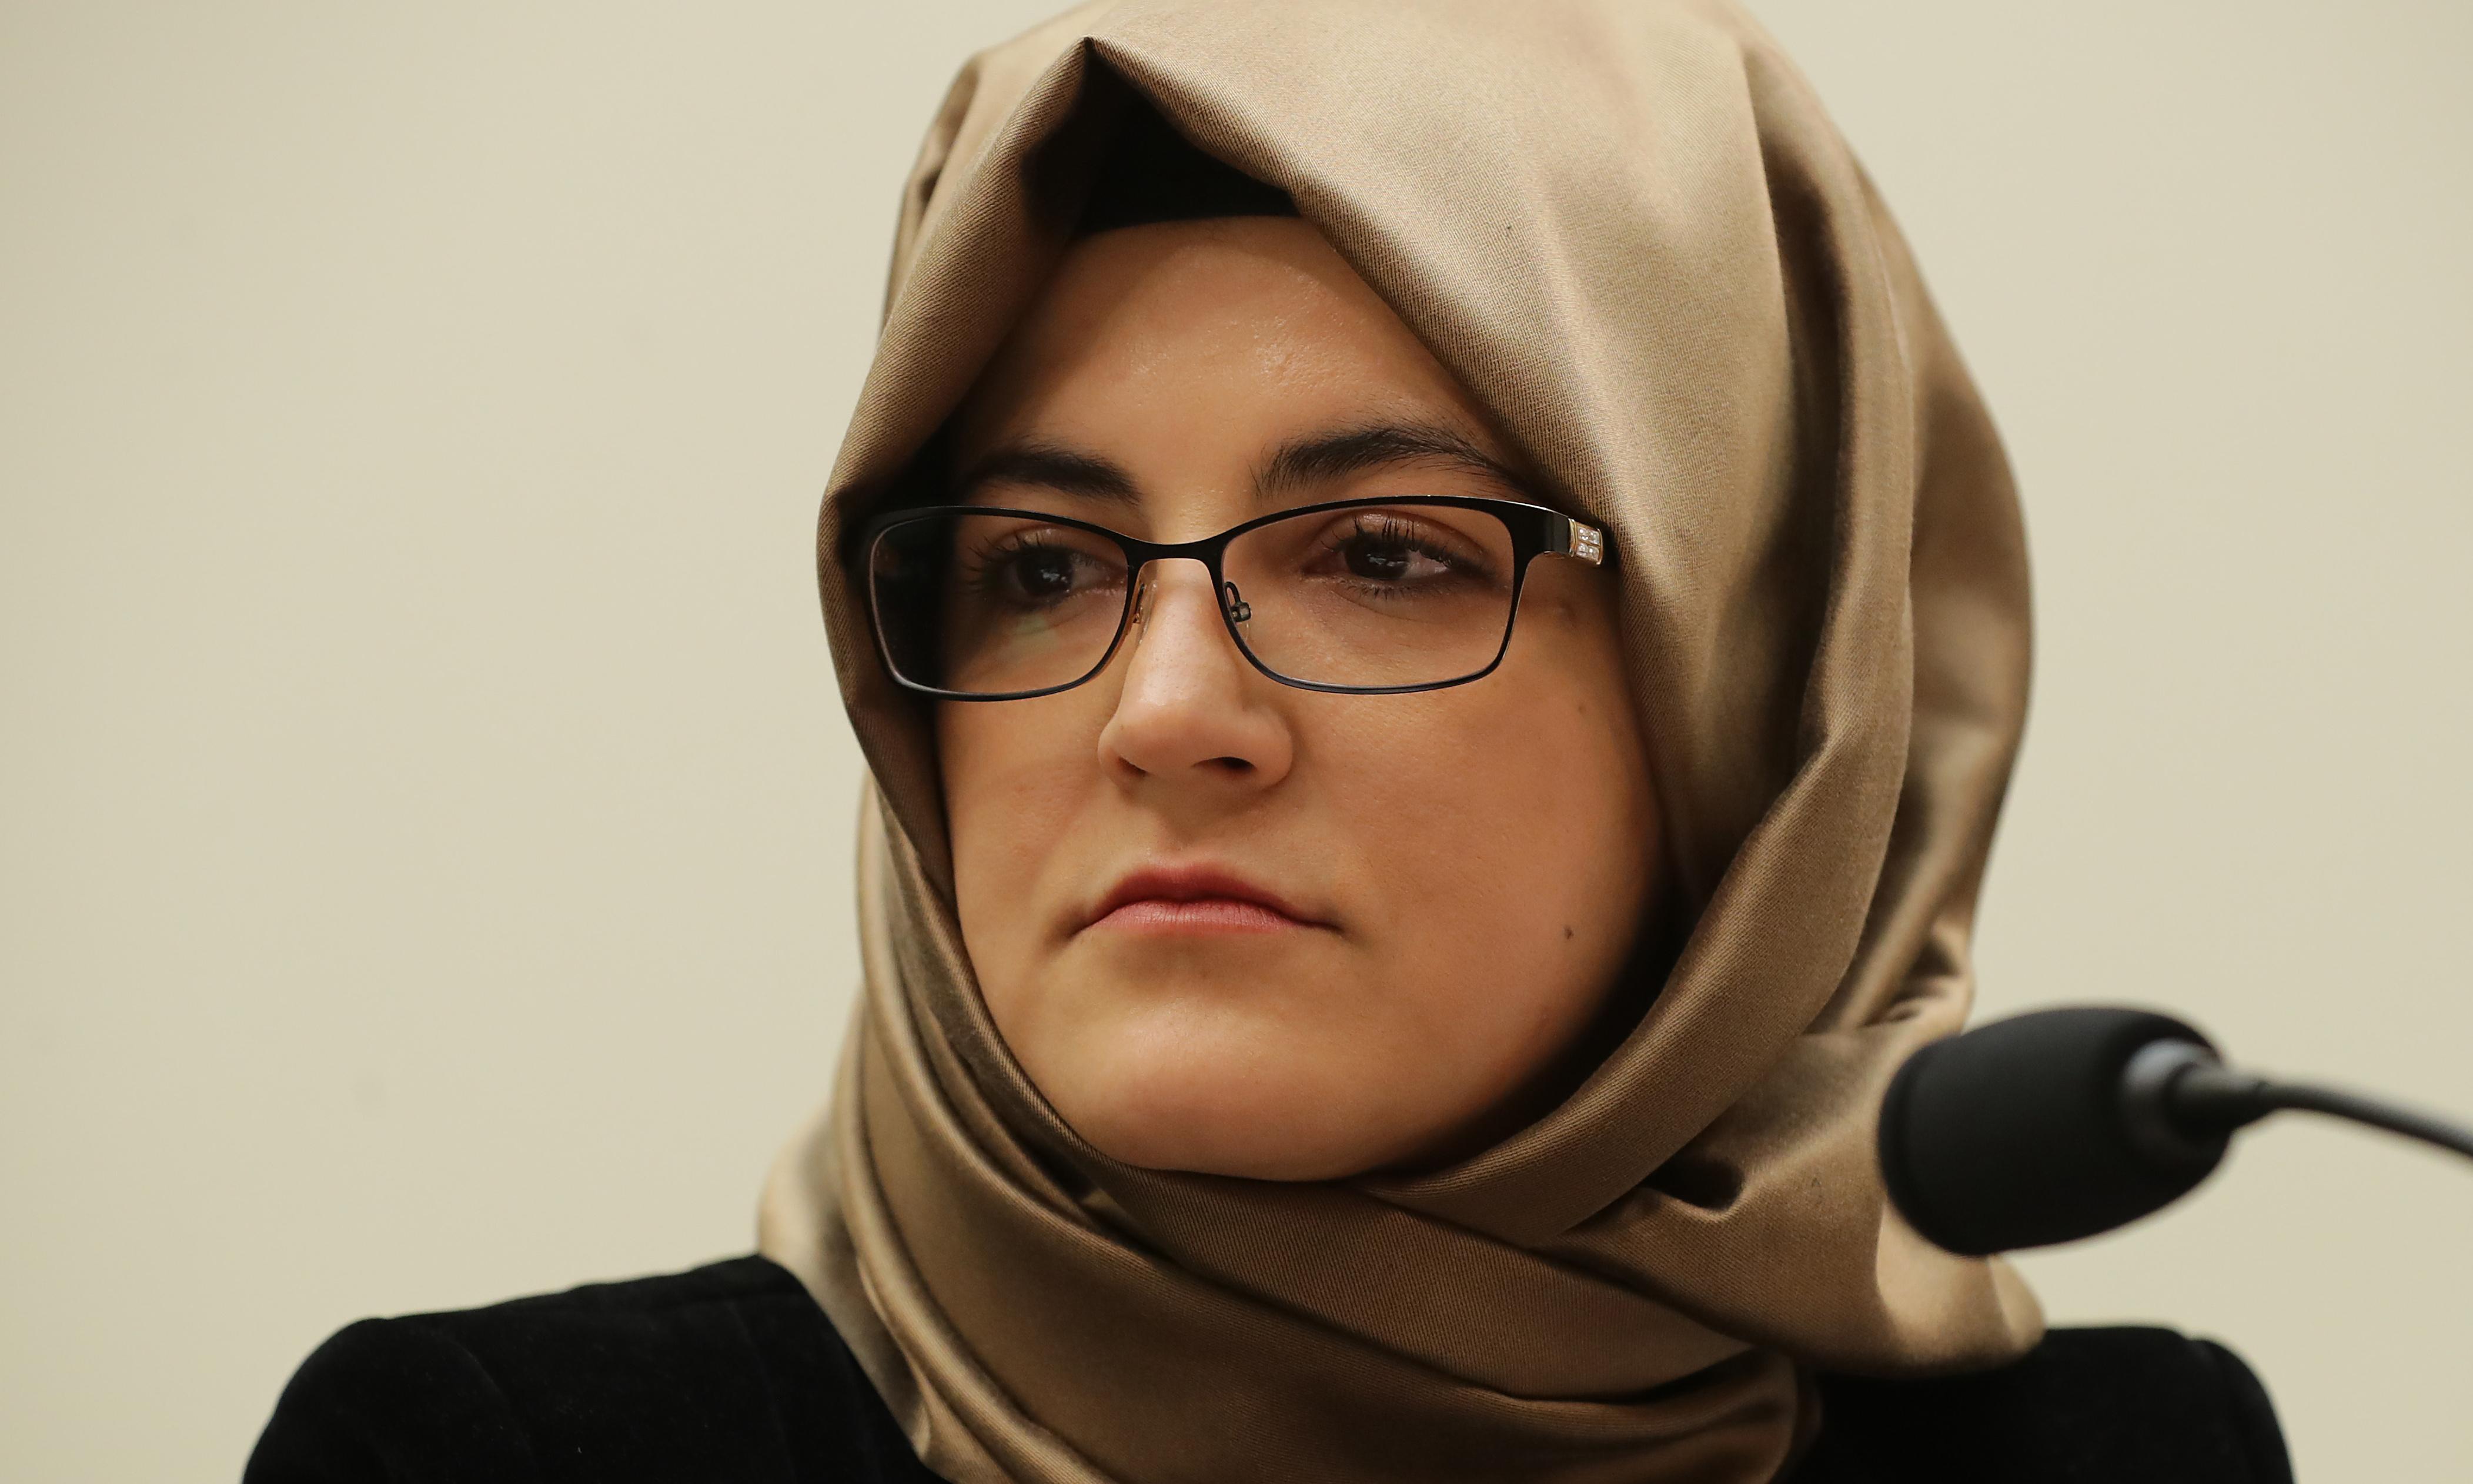 Jamal Khashoggi fiancee: 'The world still has not done anything'